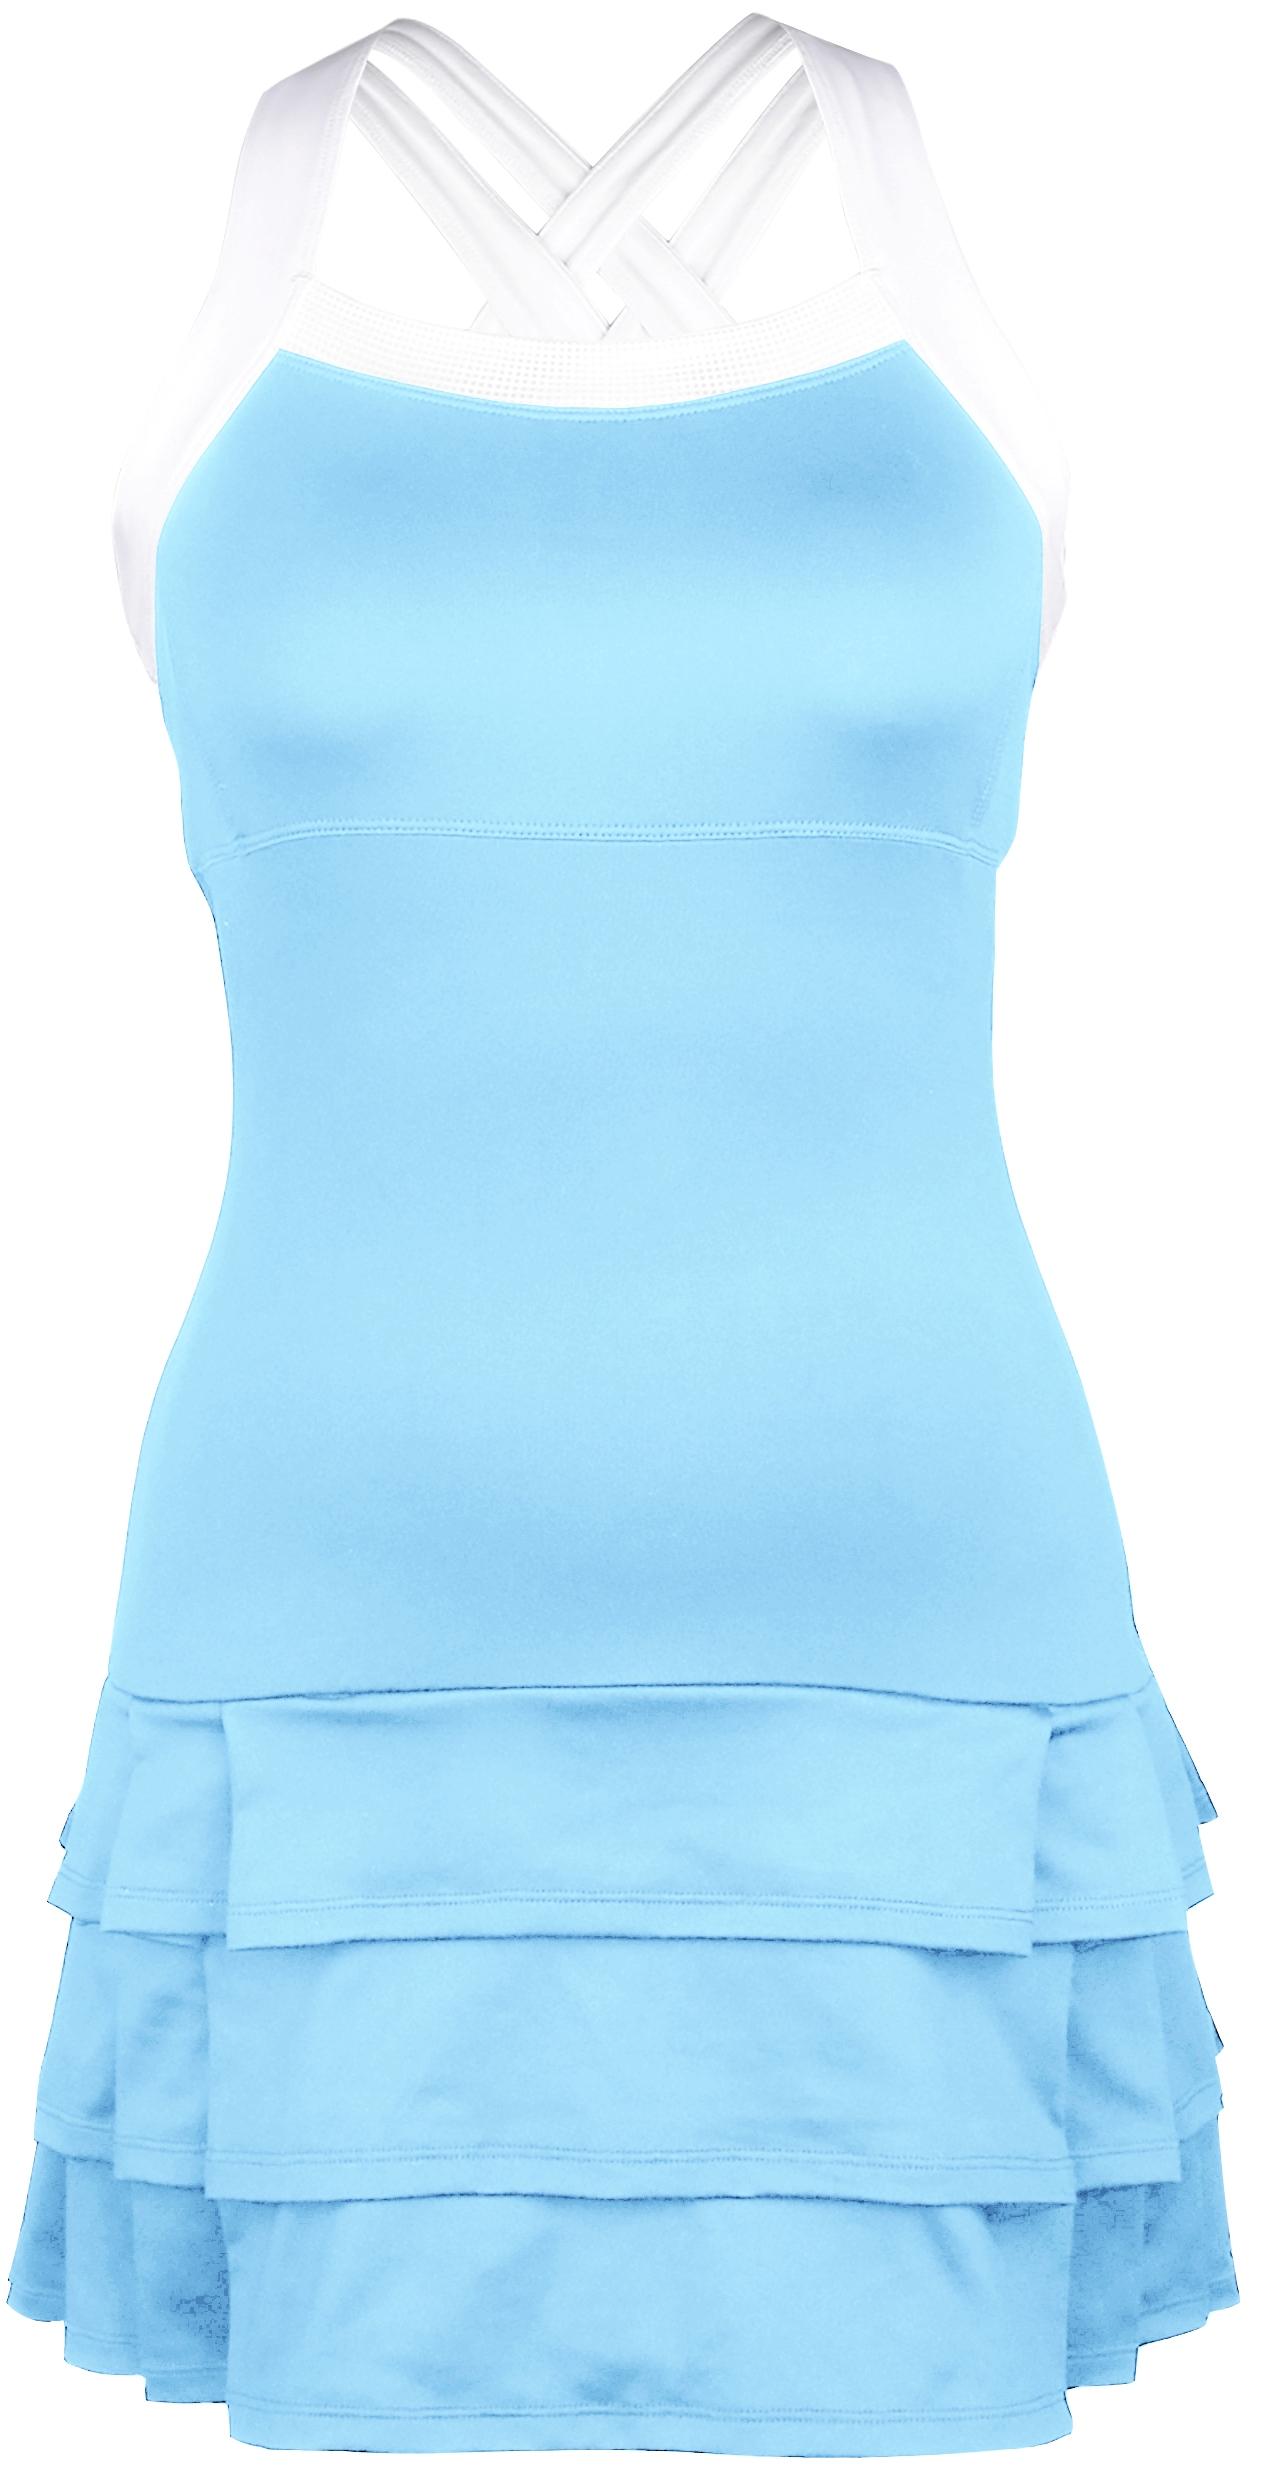 DUC Grace Women's Tennis Dress (Light Blue/White)